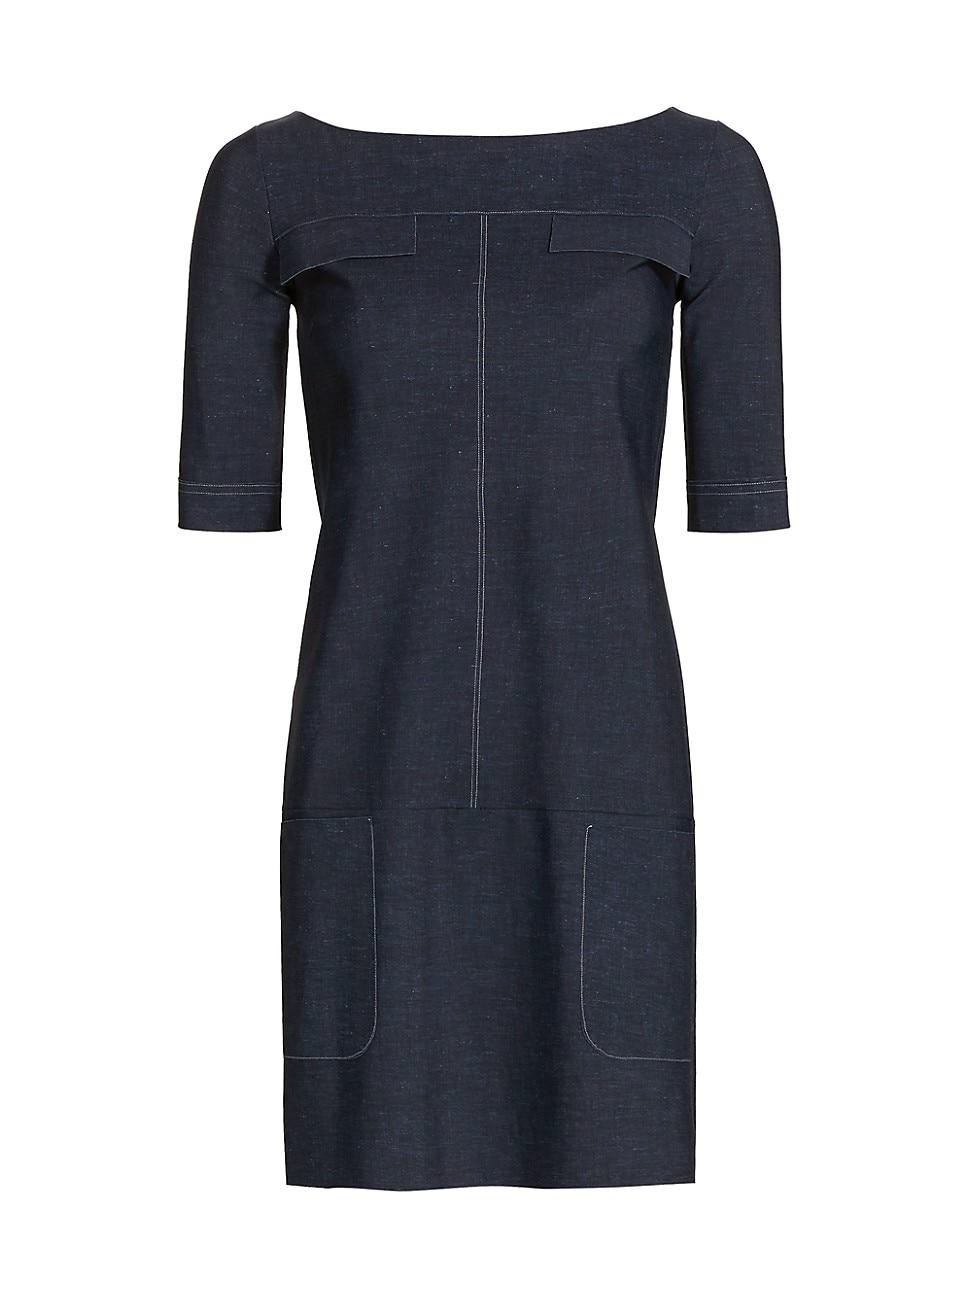 Chiara Boni La Petite Robe WOMEN'S PUBLIA SHIFT DRESS